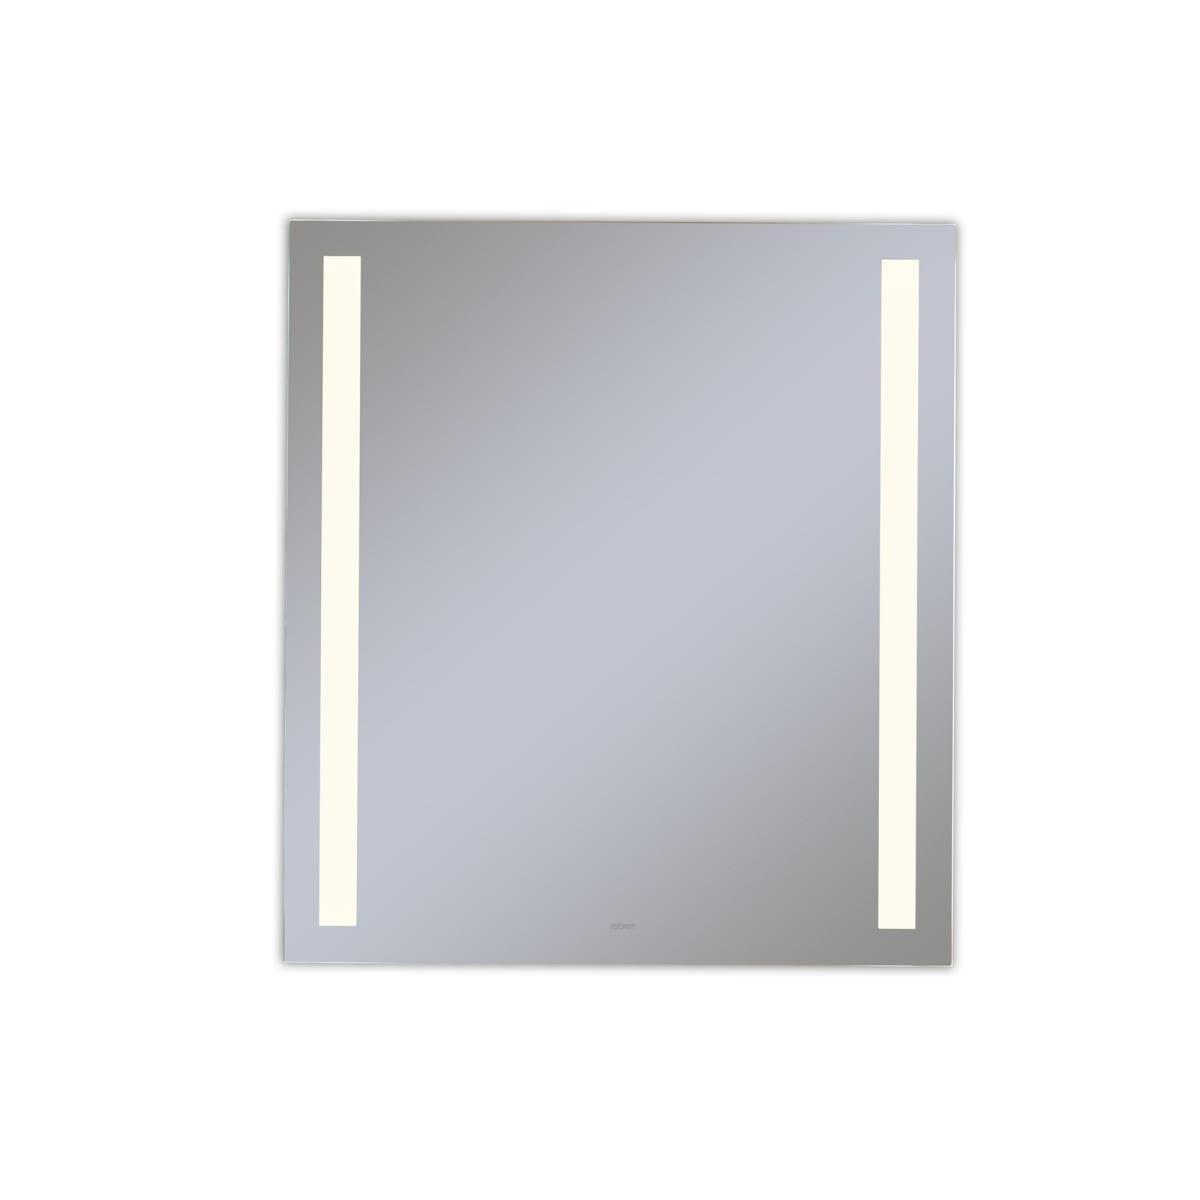 Robern Ym2430rcfpd3 Vitality 24 W X 30 H Build Com